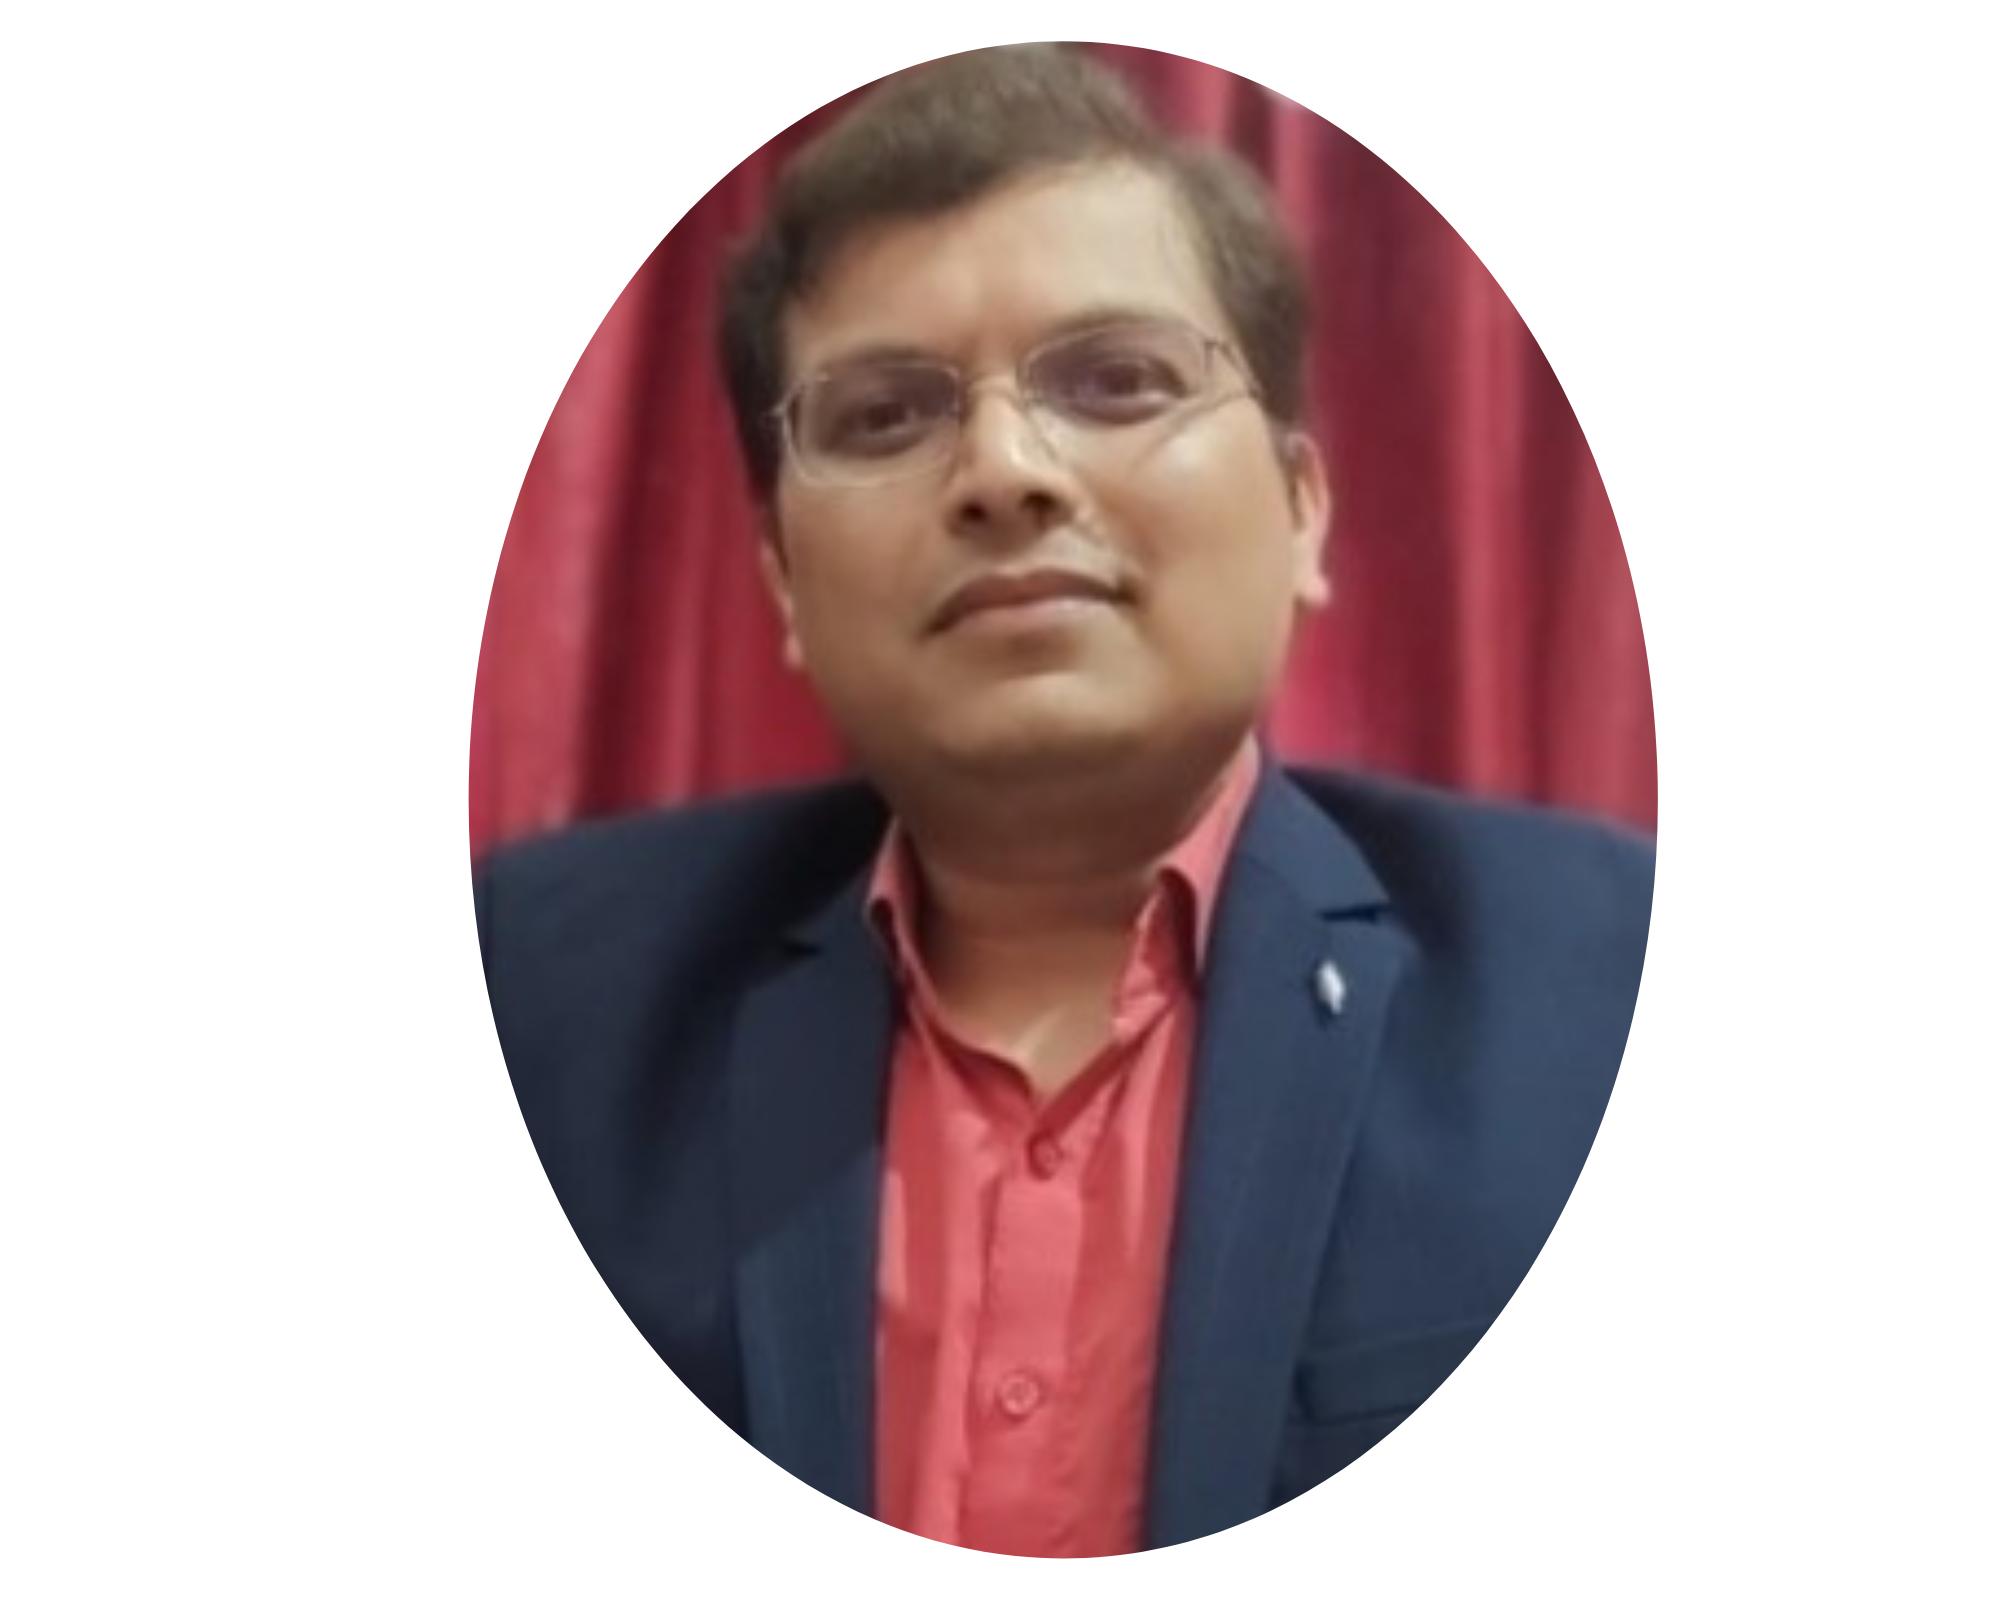 Mr Avneesh Triphati UNISED